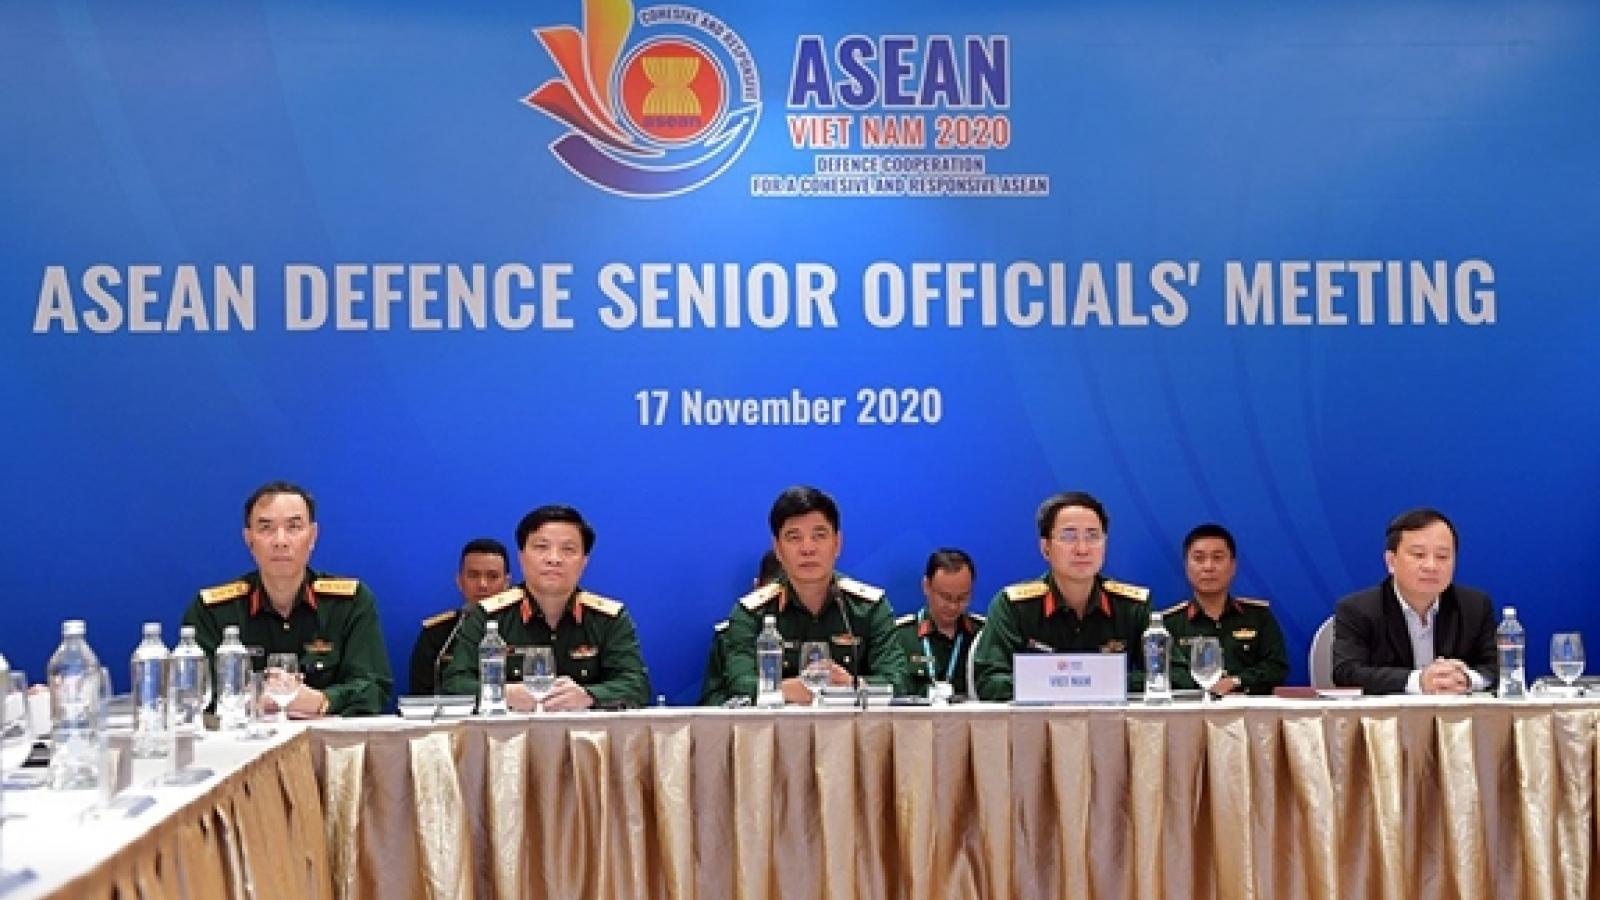 Khai mạc Hội nghị trực tuyến Quan chức Quốc phòng cấp cao ASEAN (ADSOM)